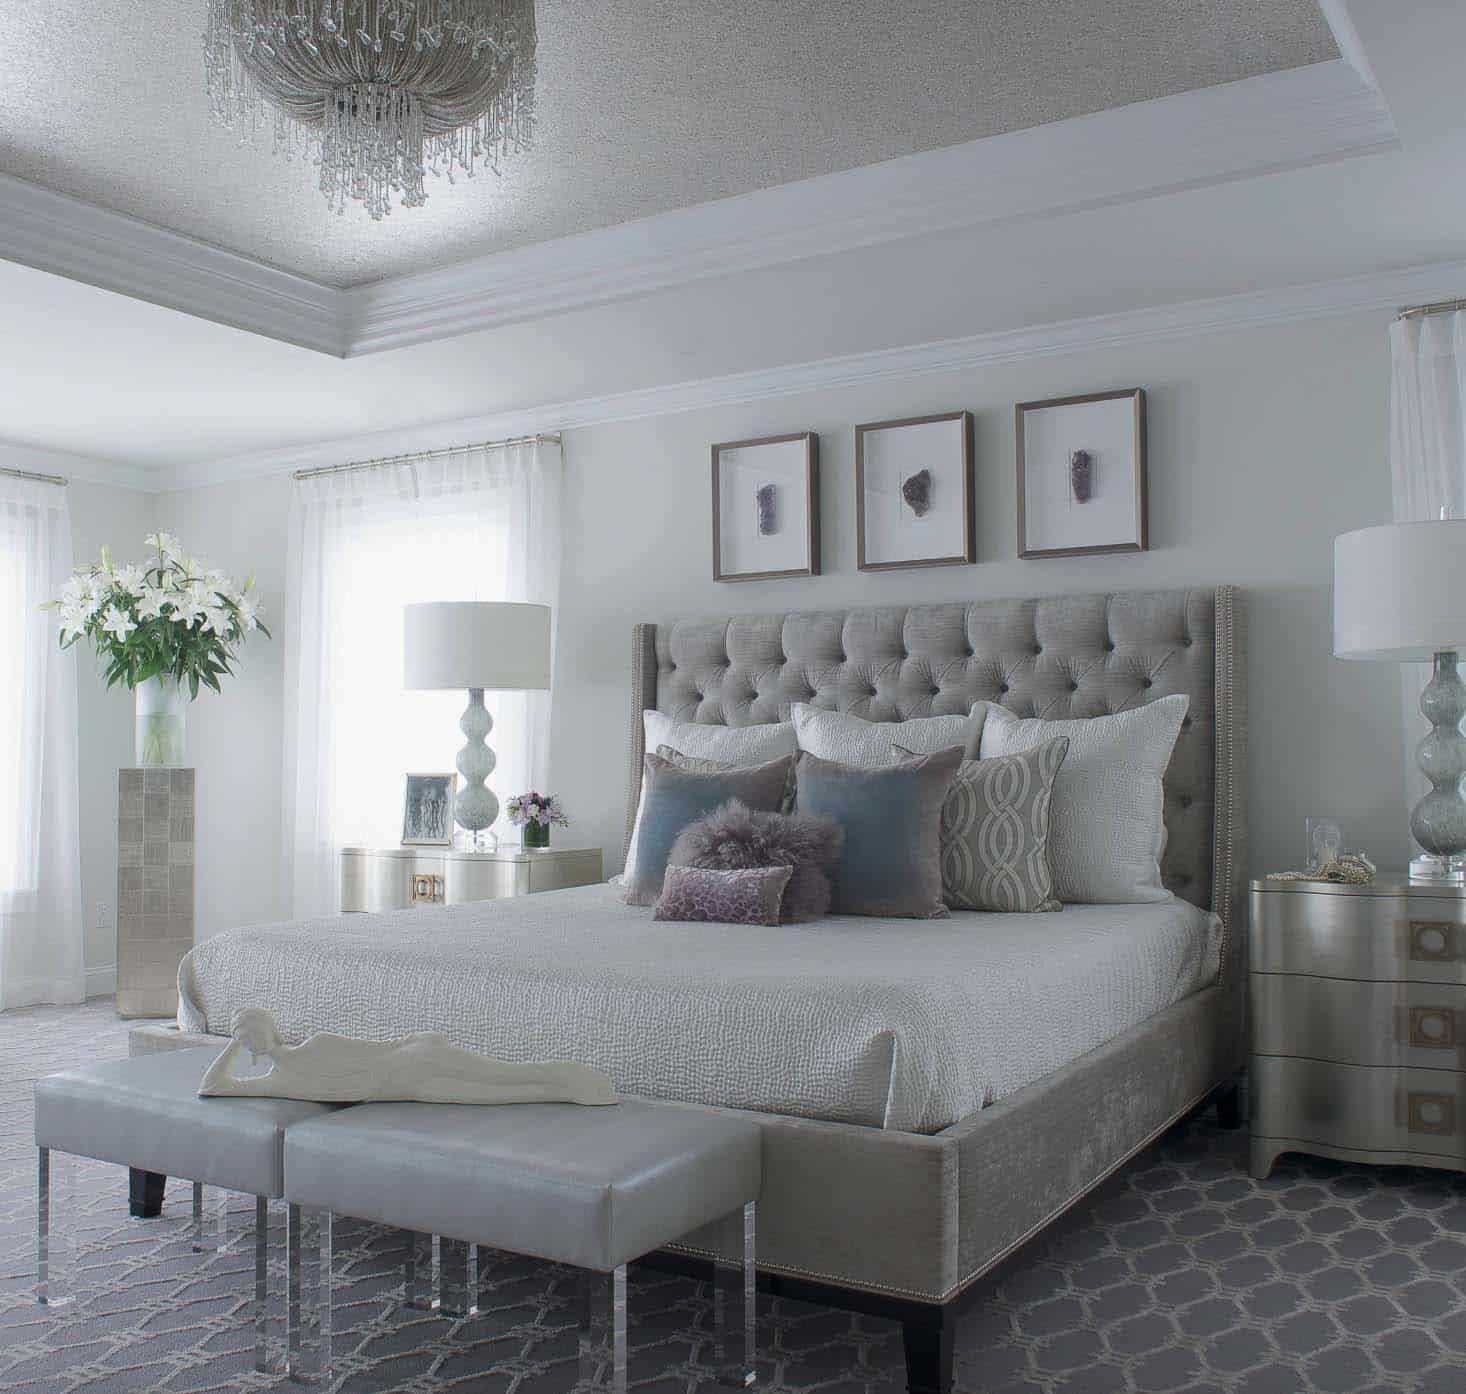 20 Serene And Elegant Master Bedroom Decorating Ideas Master Bedrooms Decor Elegant Master Bedroom Glam Bedroom Decor